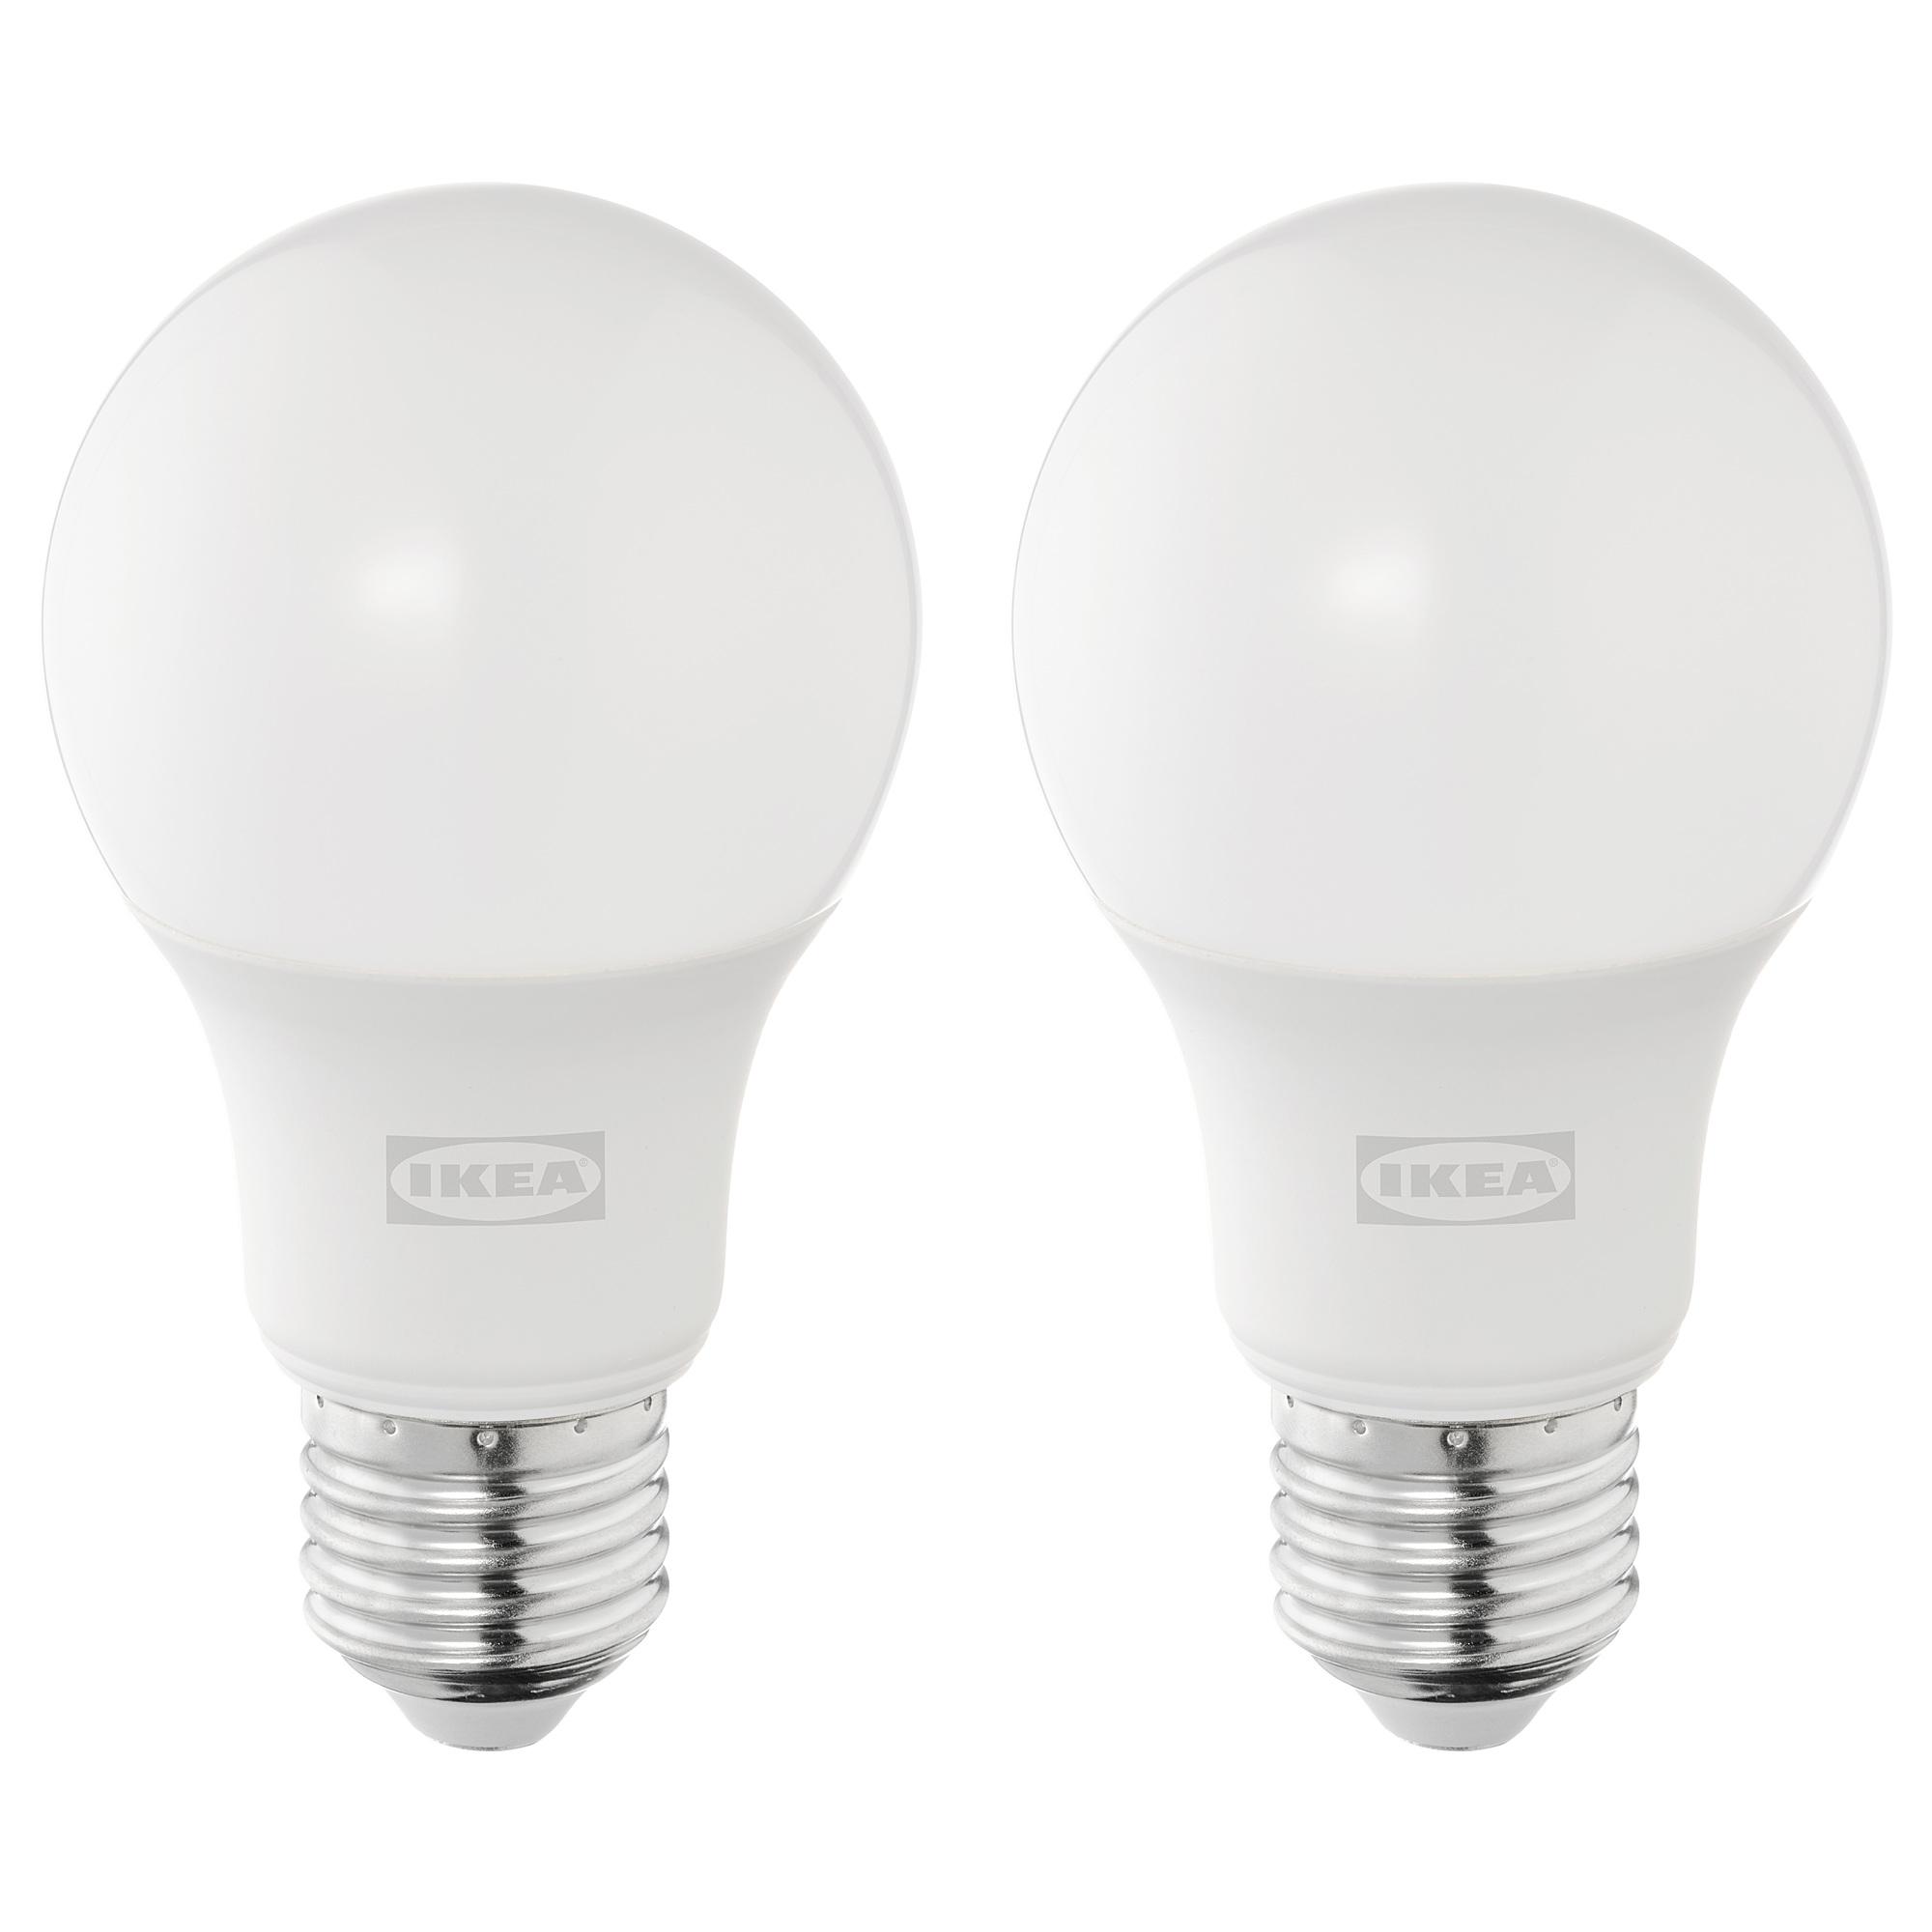 SOLHETTA LED bulb E27 470 lumen